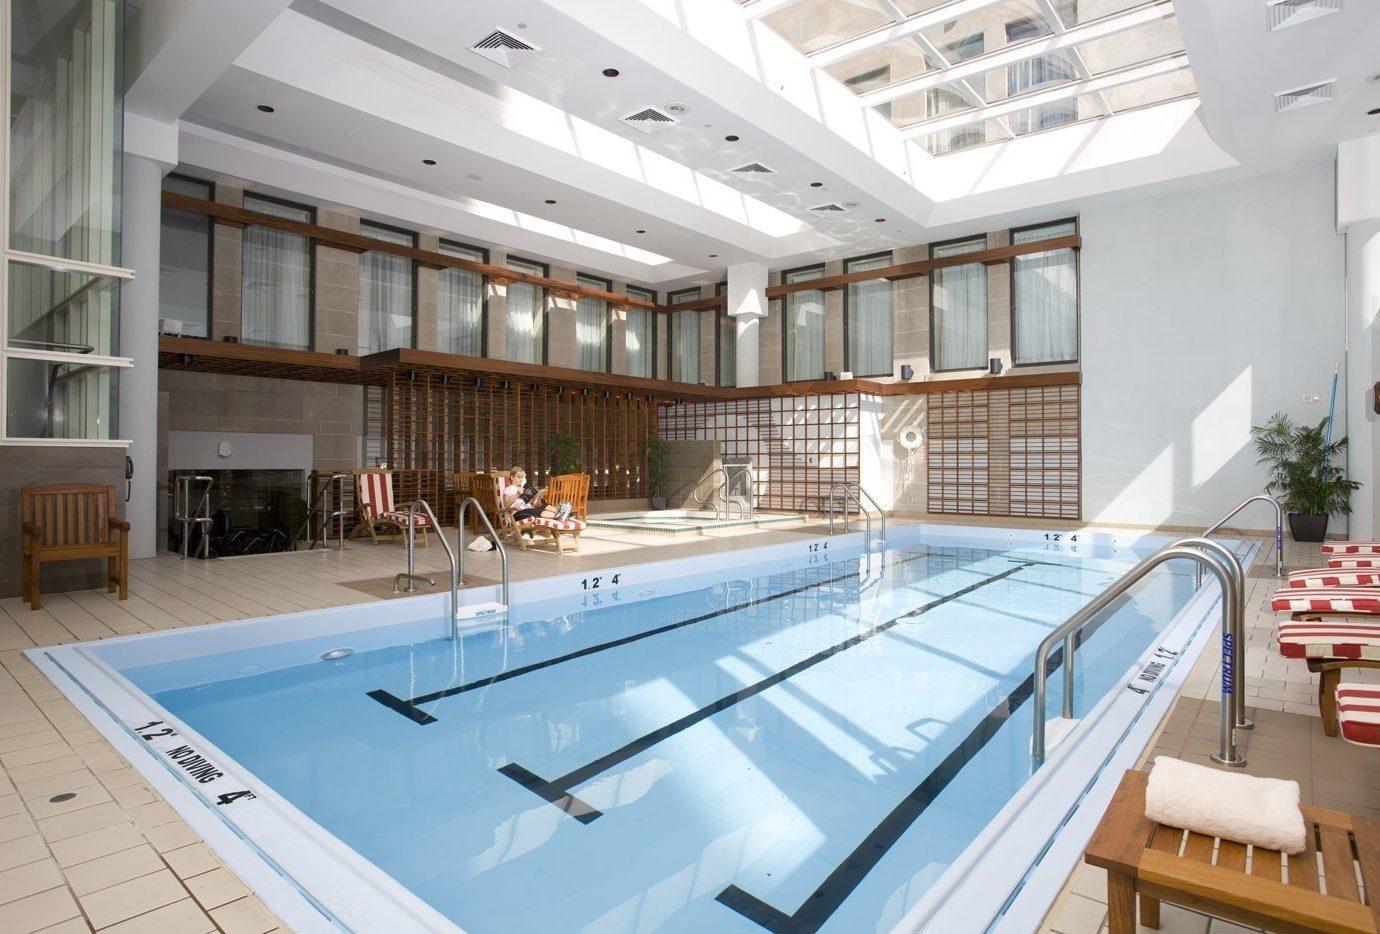 Hotels indoor swimming pool property room ceiling floor leisure centre condominium Architecture estate interior design daylighting counter Lobby Design headquarters mansion Deck